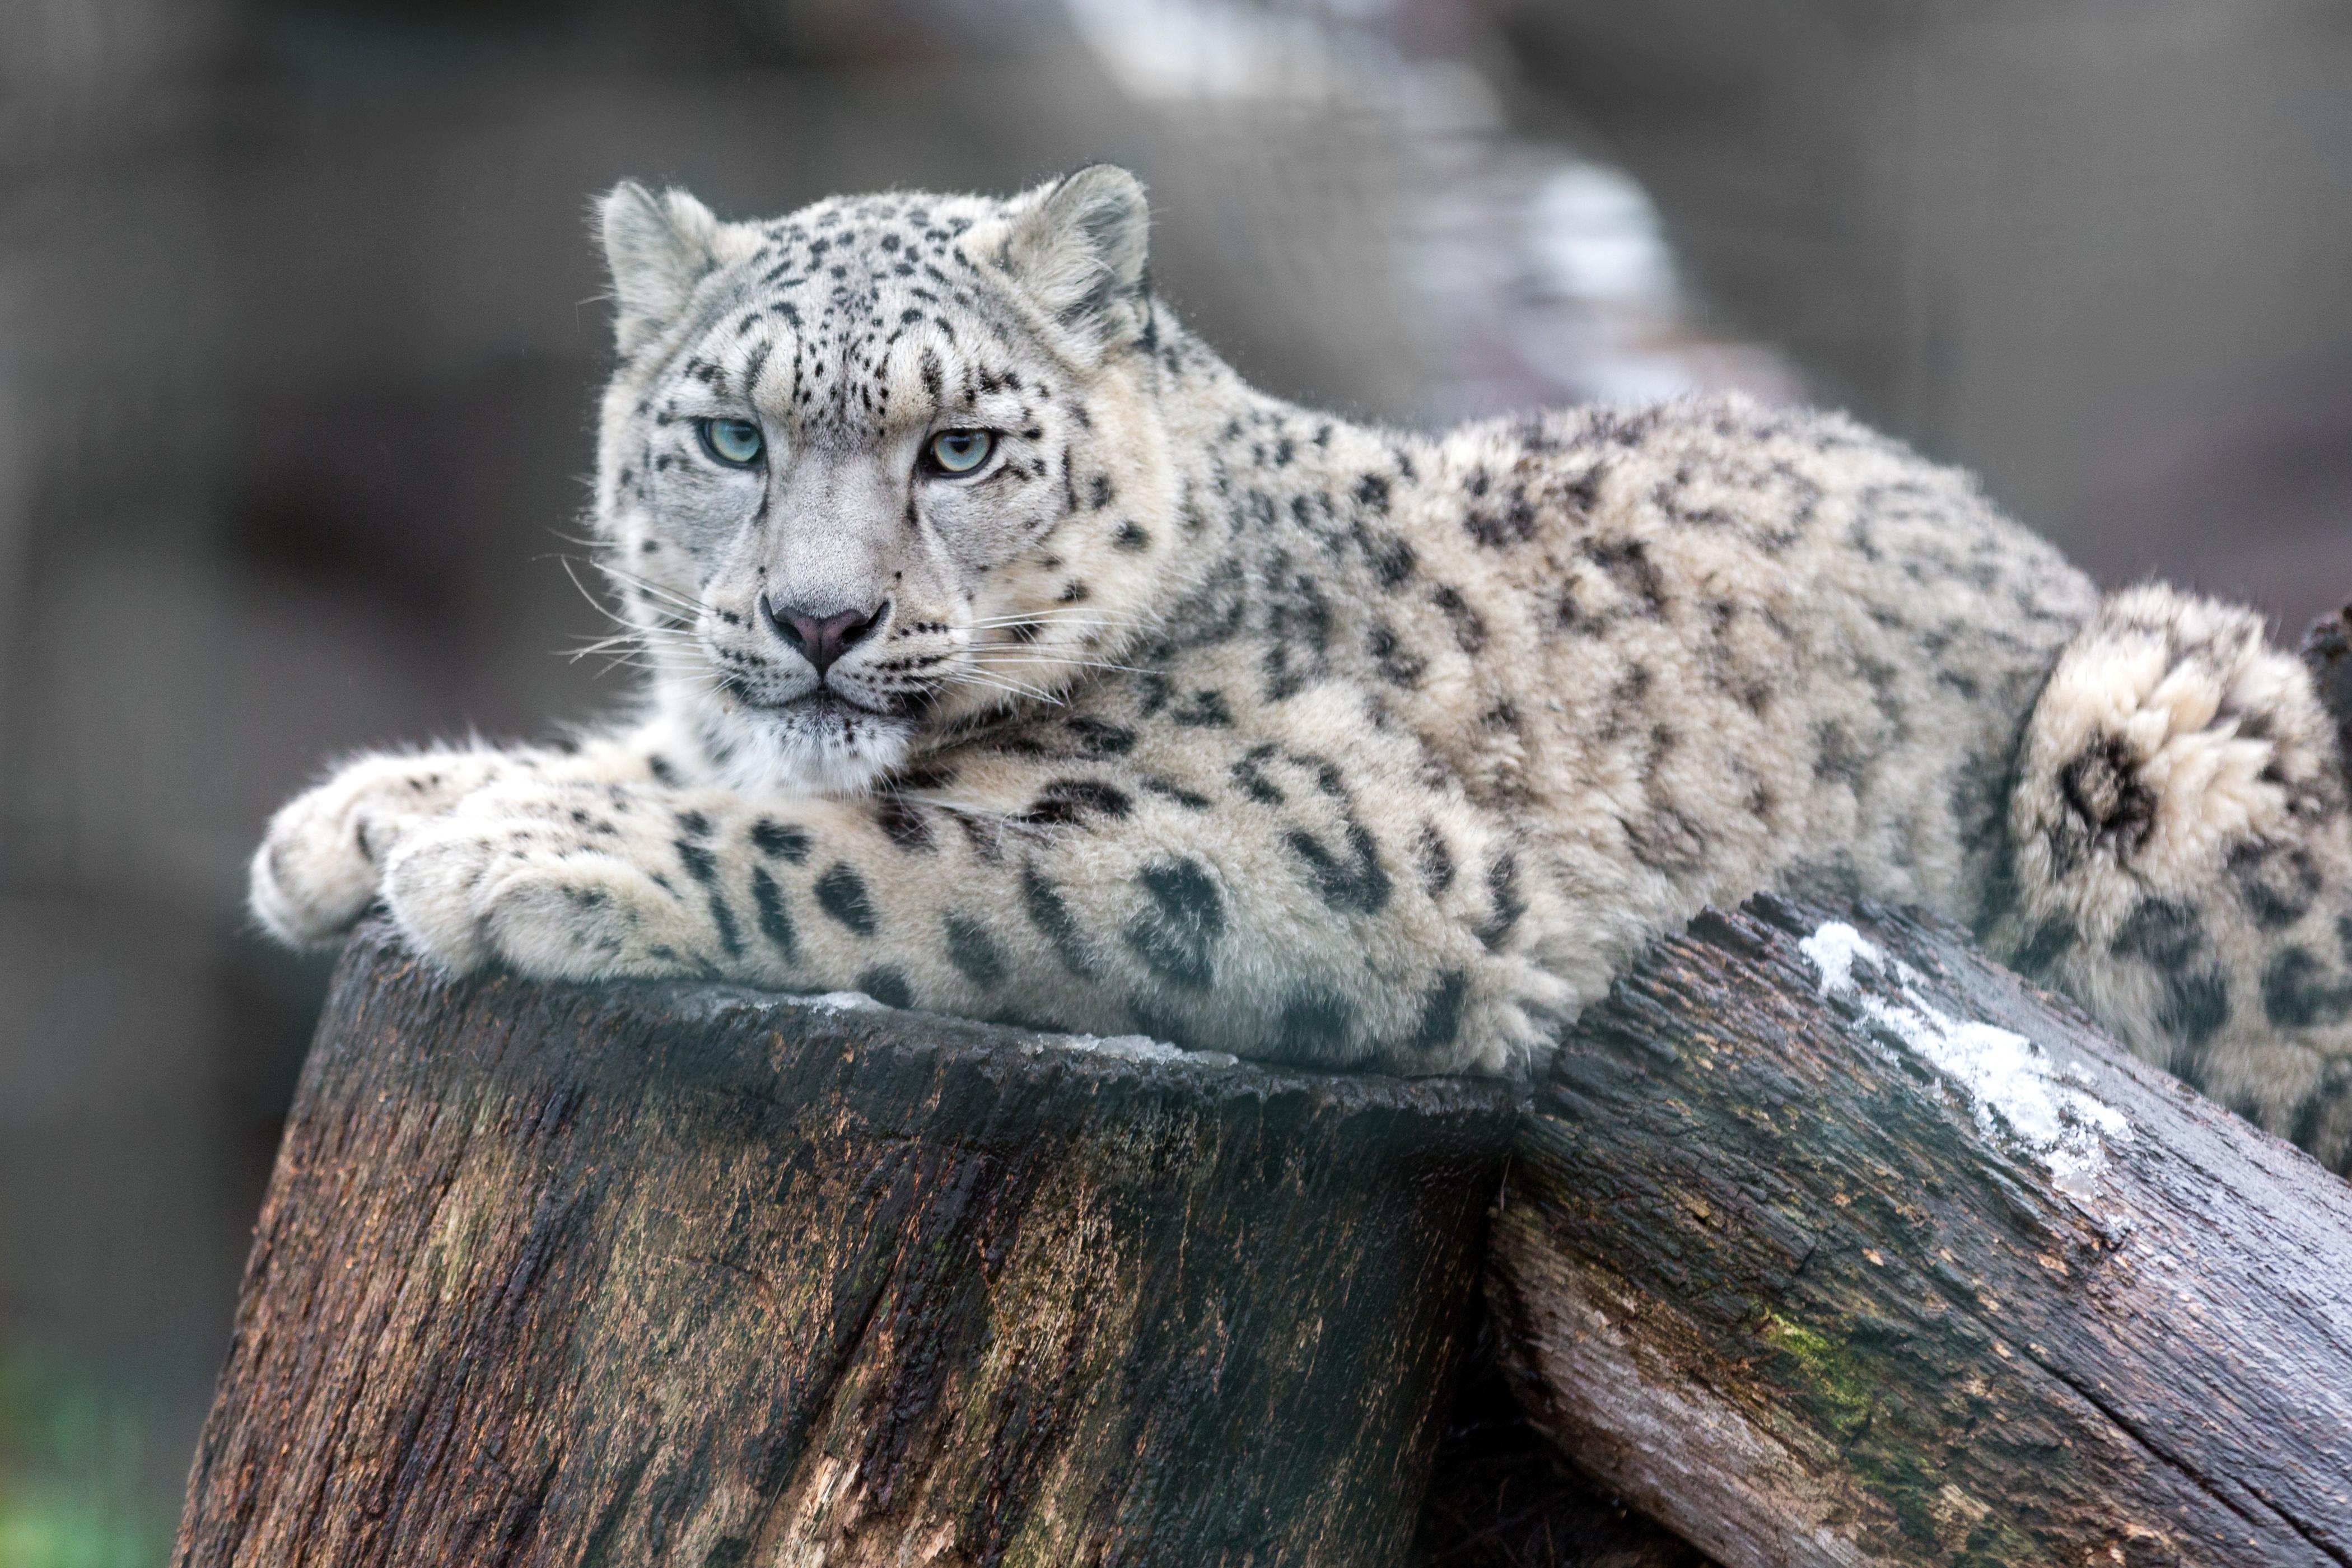 Snow Leopard 4k Ultra Hd Wallpaper Background Image 4200x2800 Id 779247 Wallpaper Abyss